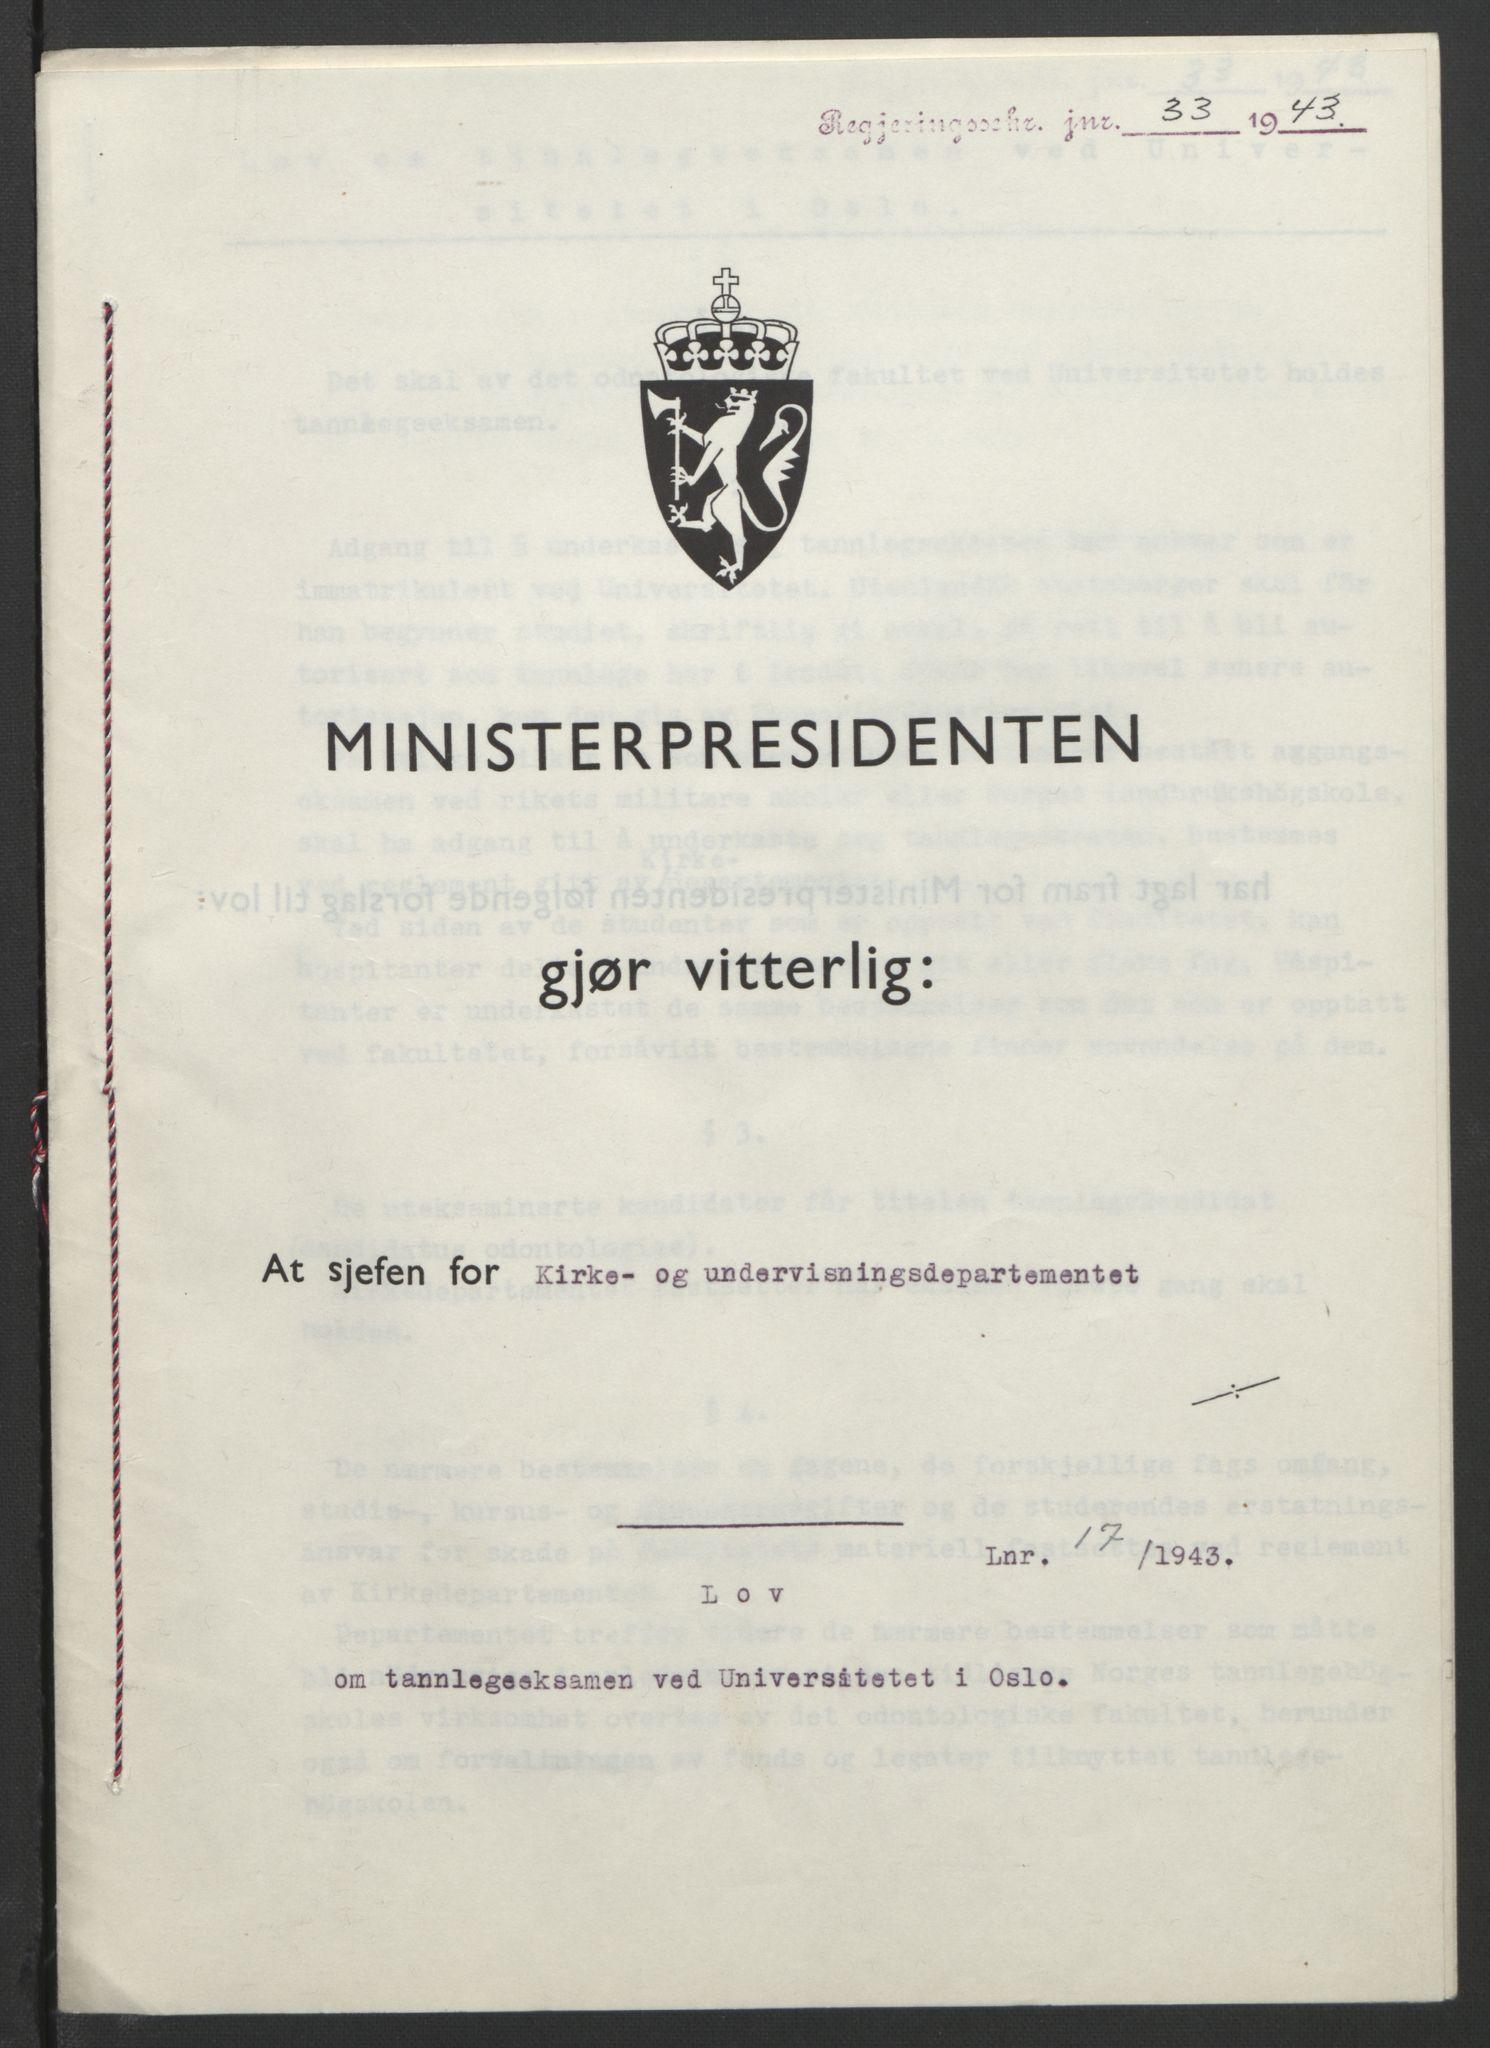 RA, NS-administrasjonen 1940-1945 (Statsrådsekretariatet, de kommisariske statsråder mm), D/Db/L0099: Lover, 1943, s. 67